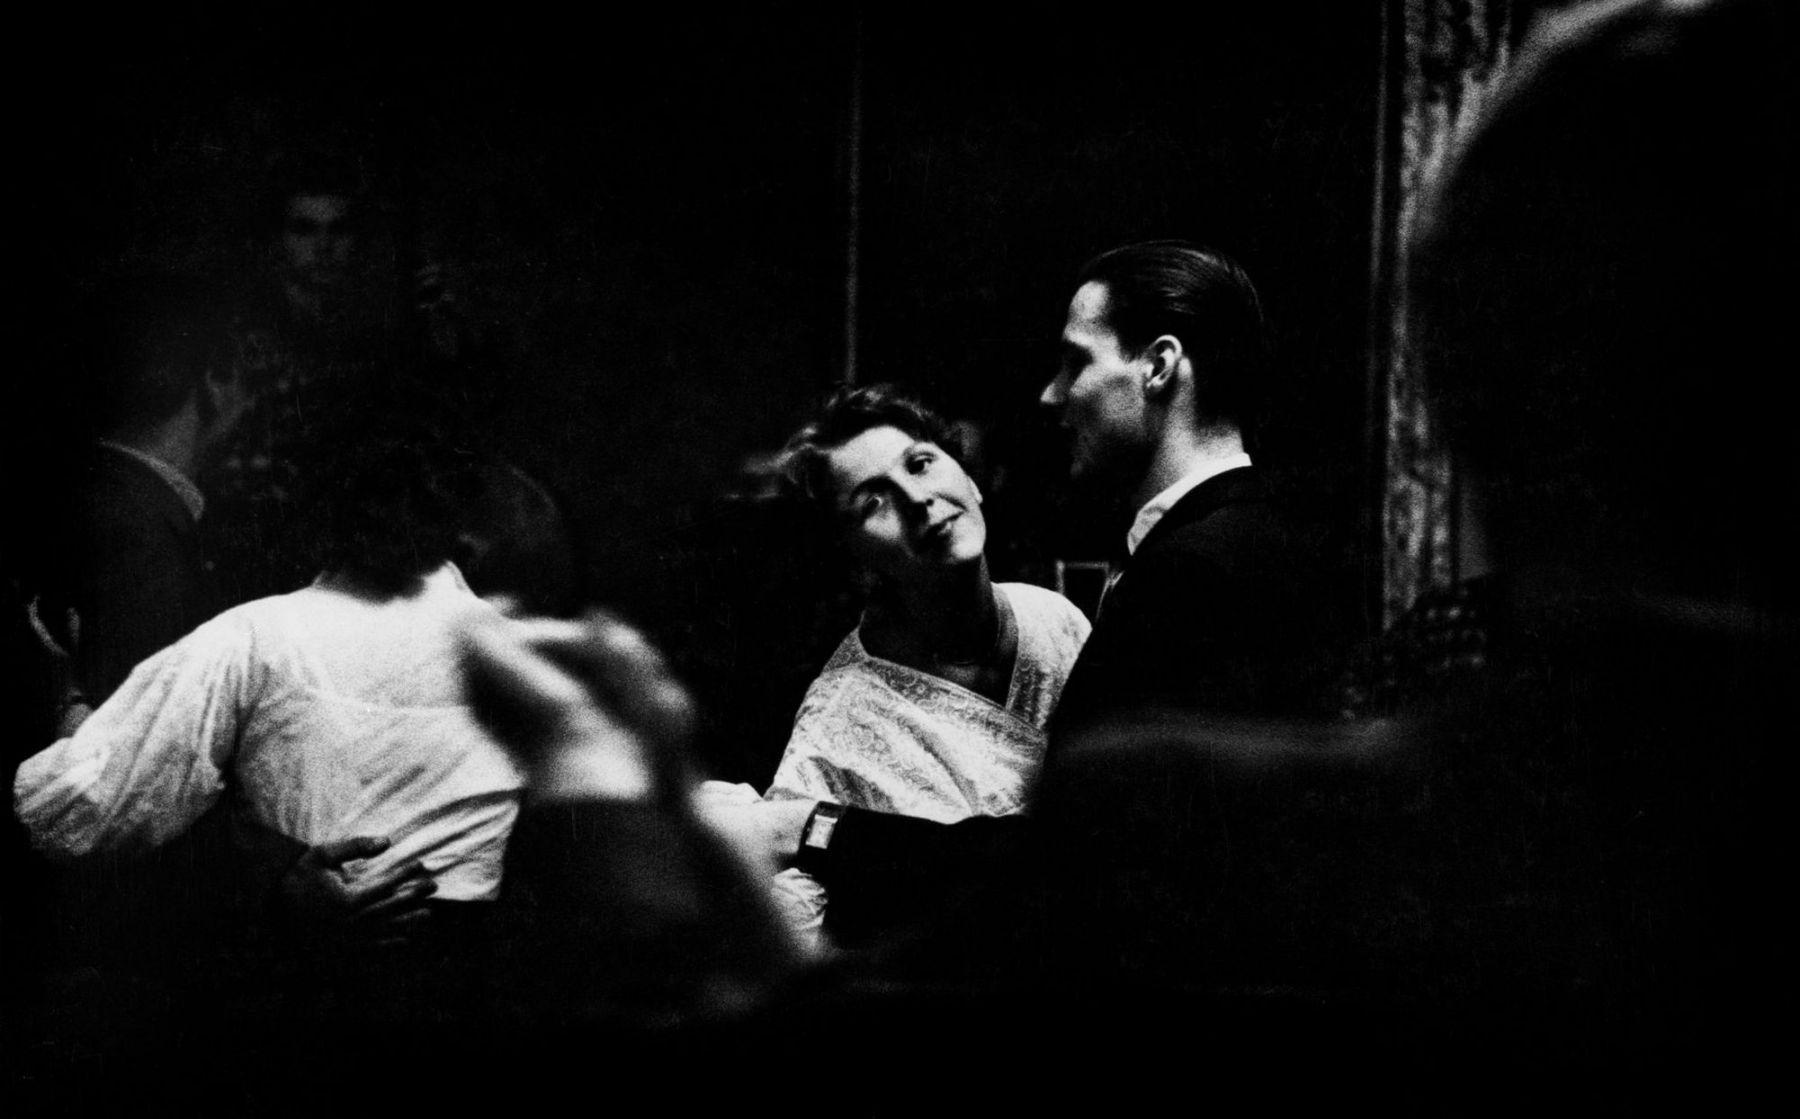 René Burri: Tanzcafé in Weimar, 1957.